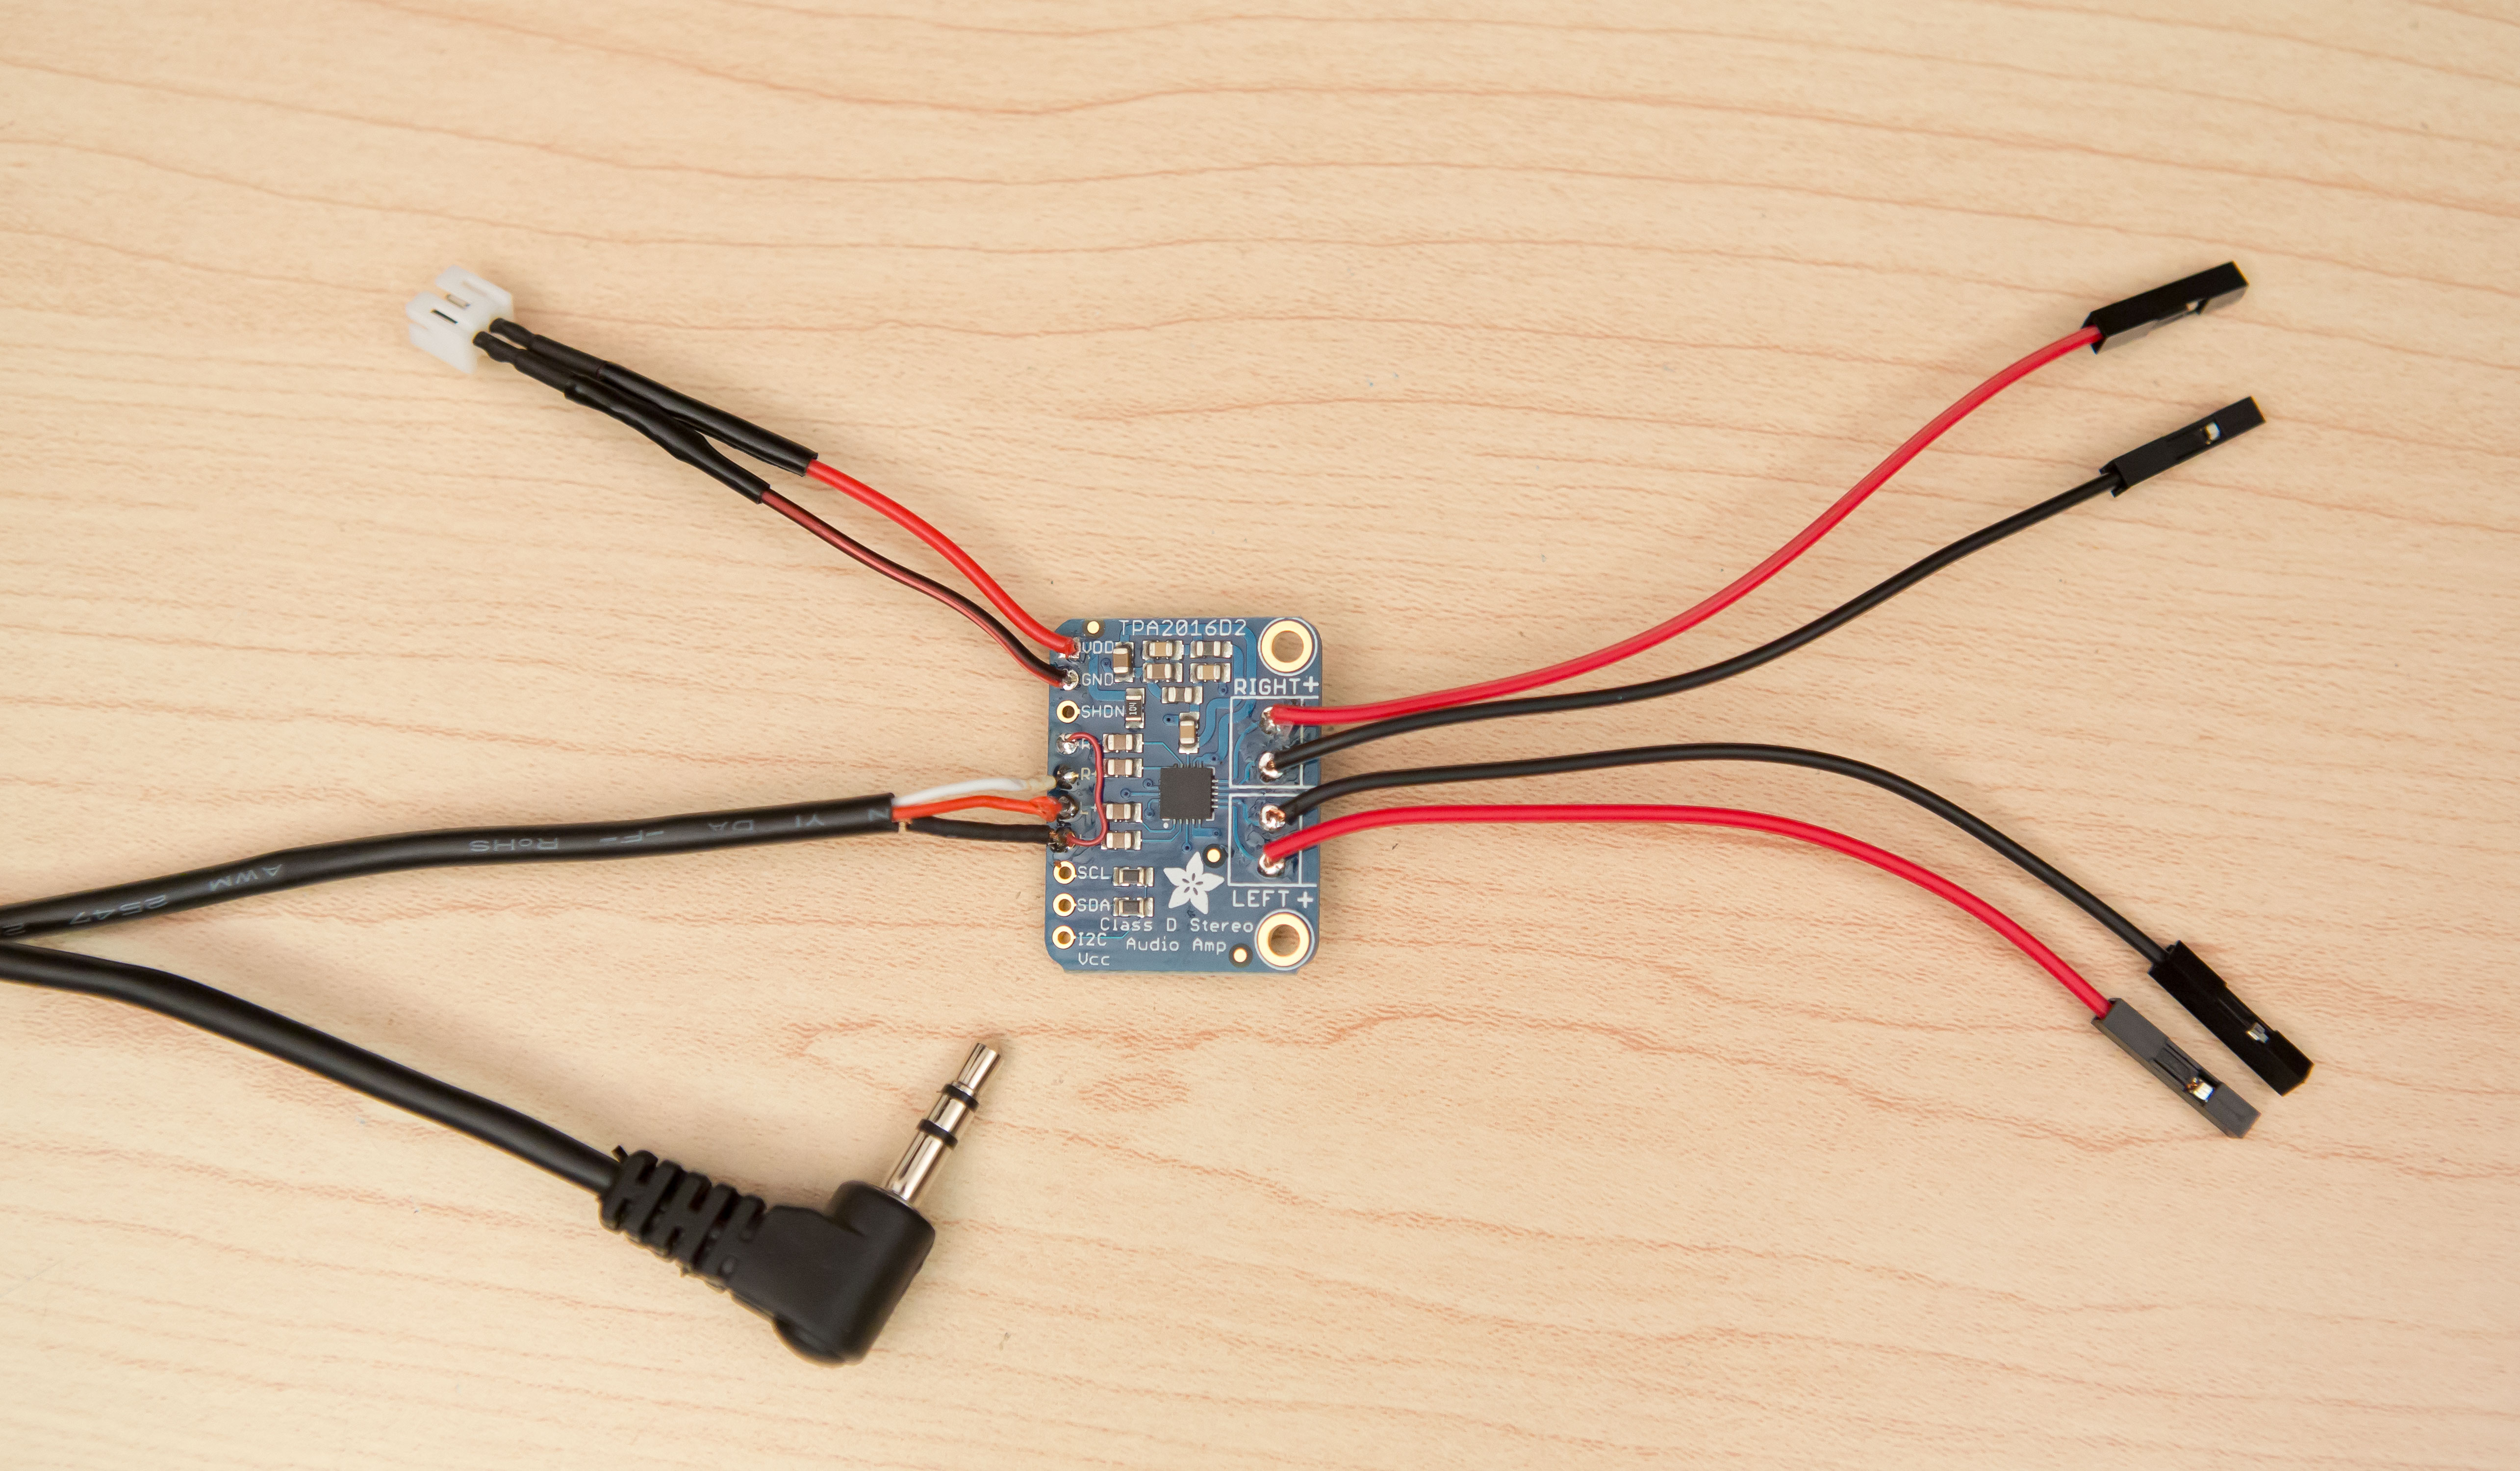 3d_printing_soldered-chip.jpg